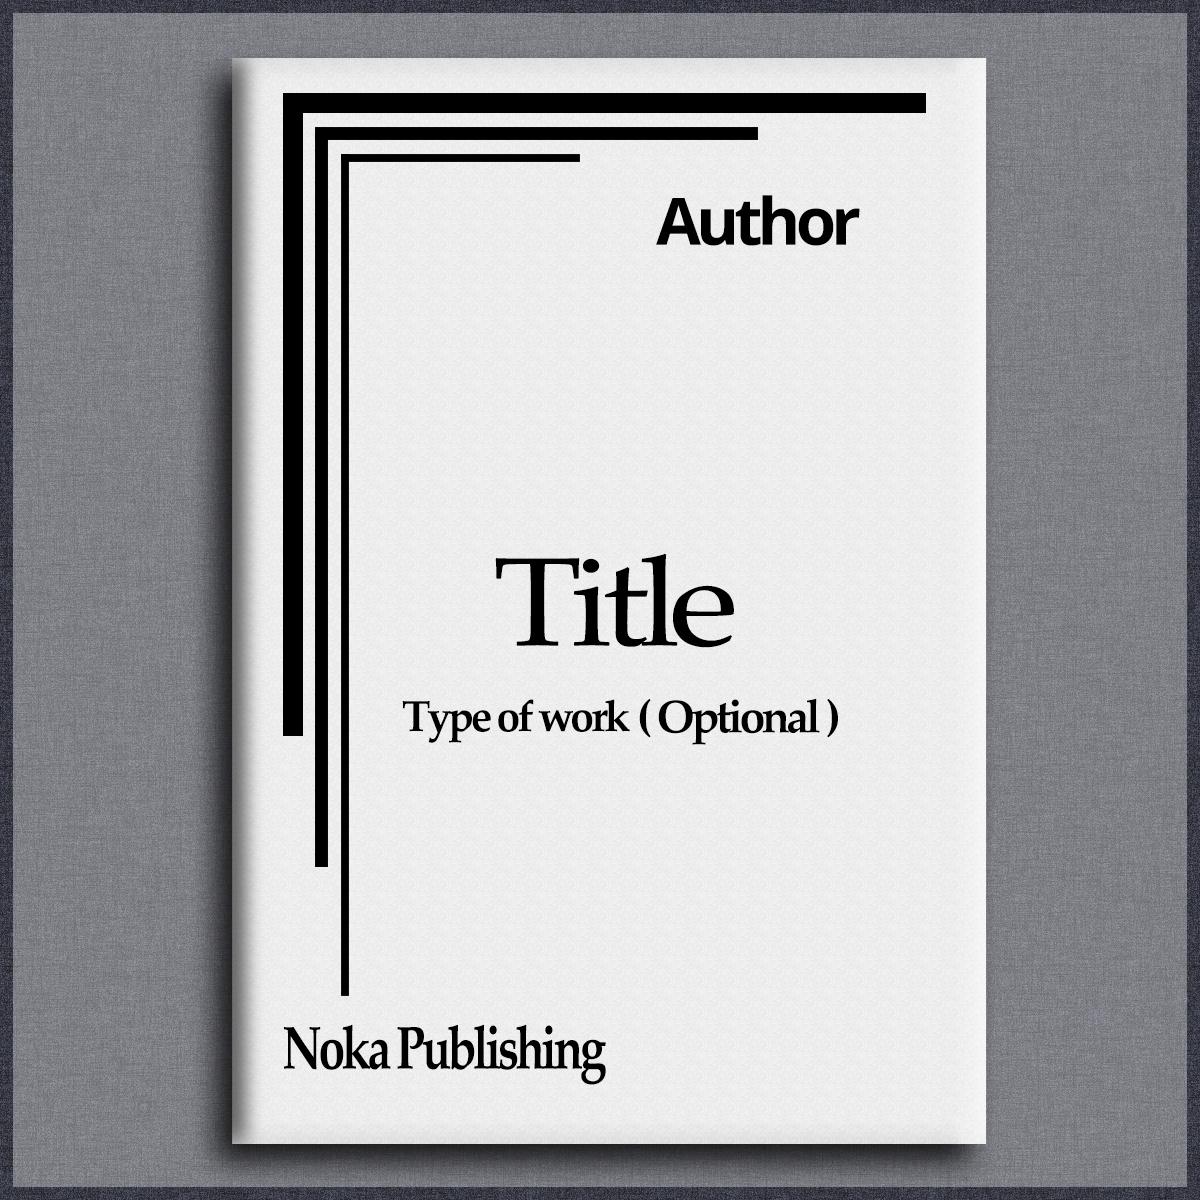 Book Cover Design Black : Conservative serious non profit book cover design for a